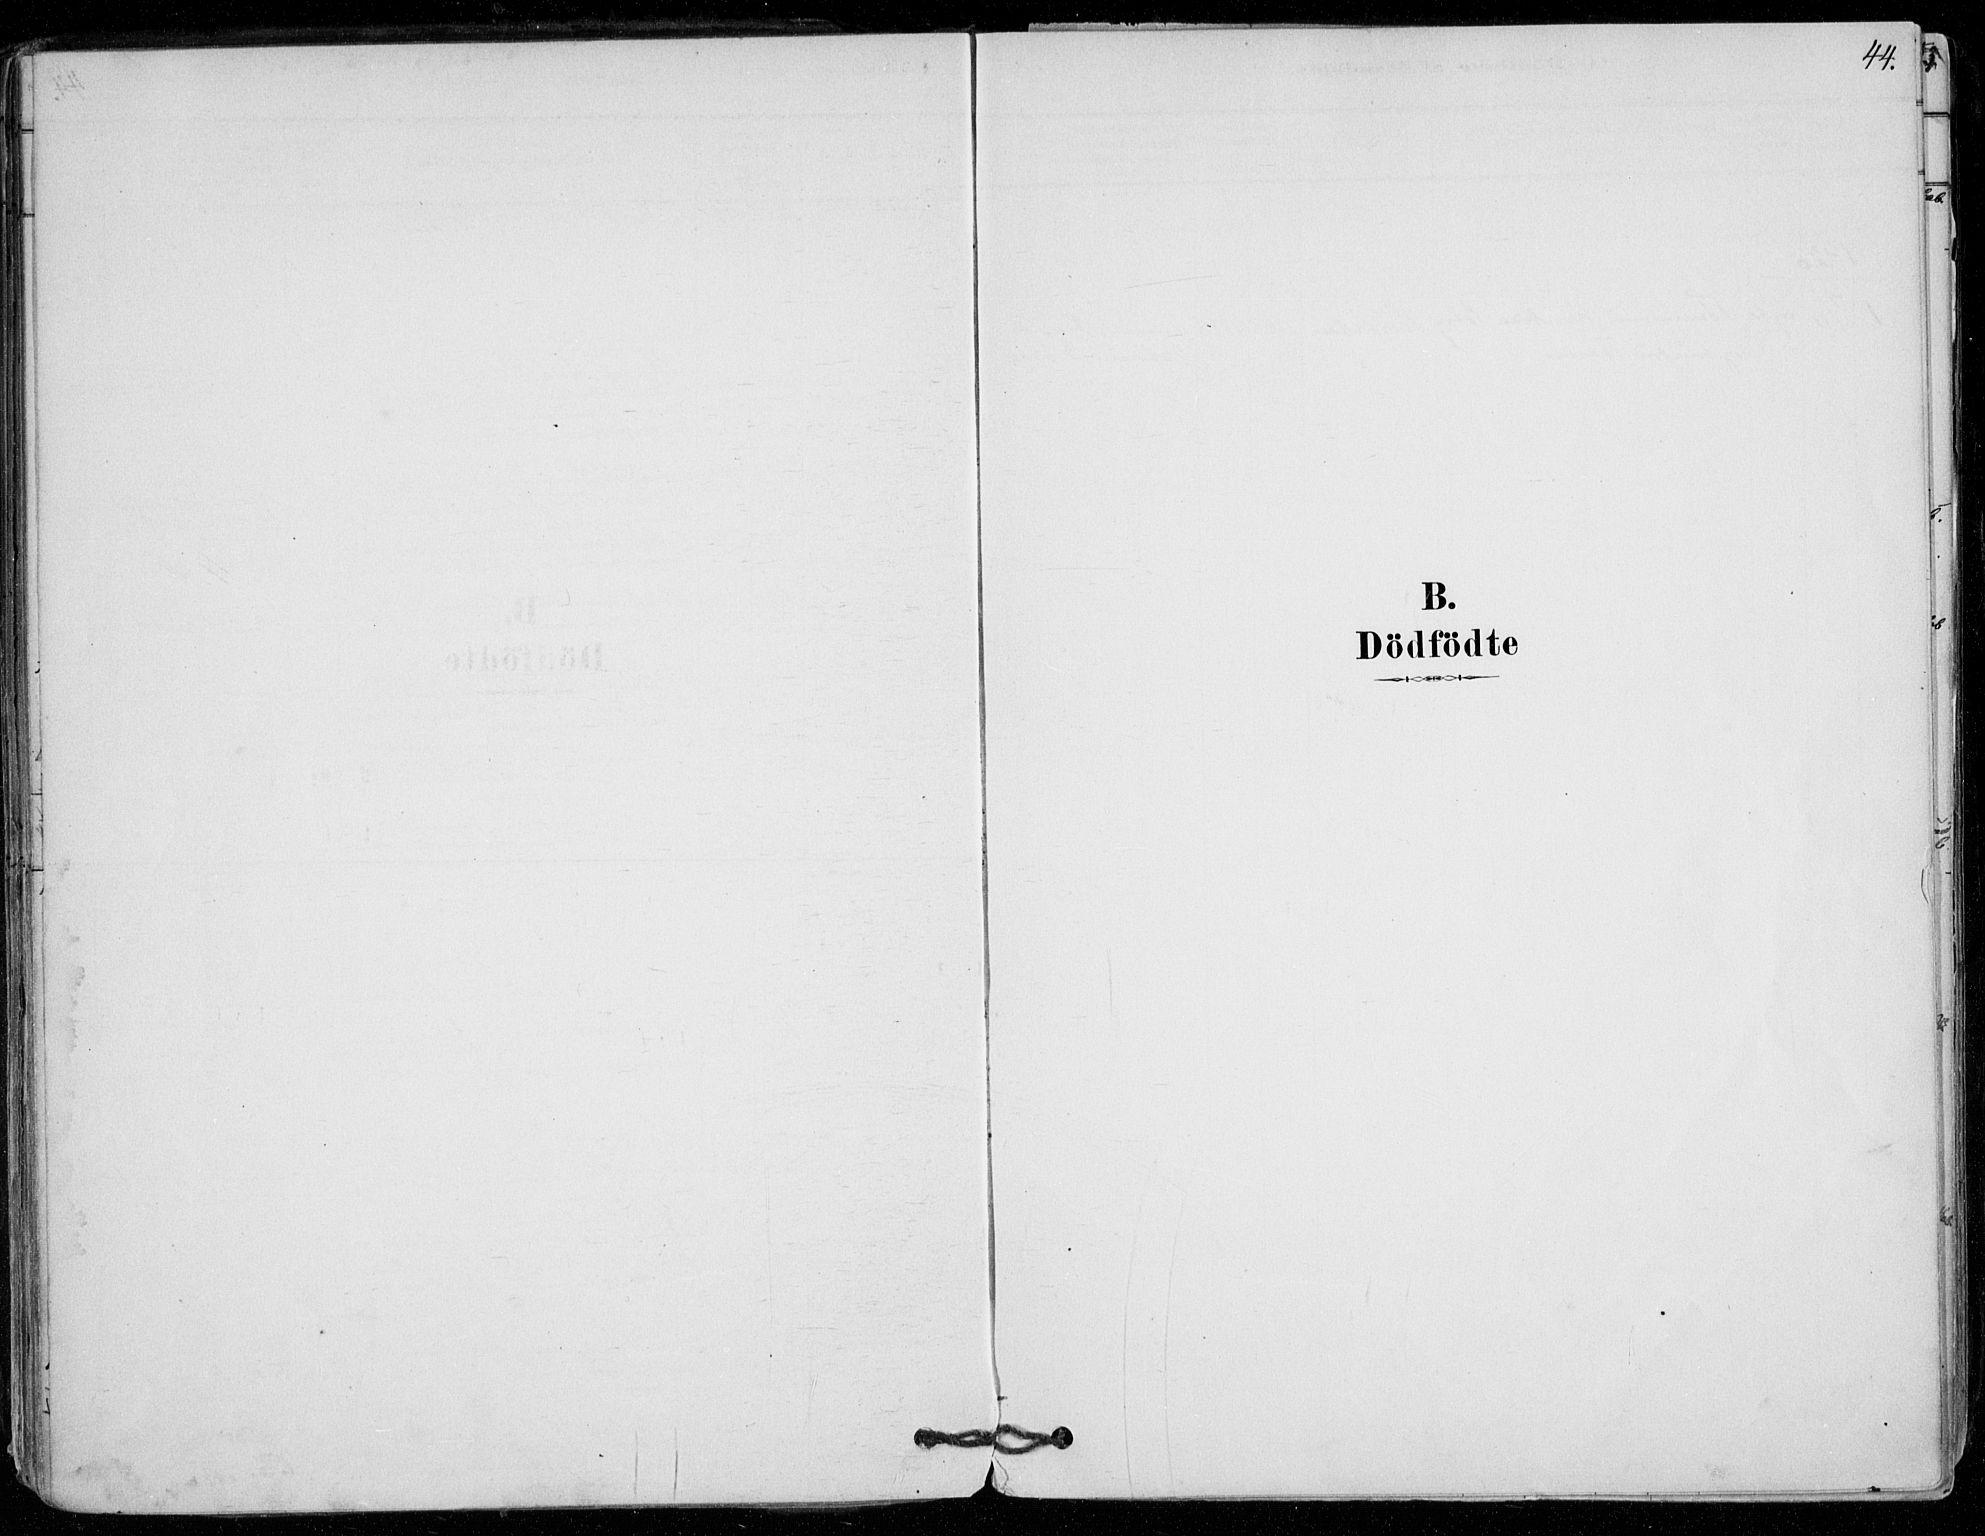 SAO, Vestby prestekontor Kirkebøker, F/Fd/L0001: Ministerialbok nr. IV 1, 1878-1945, s. 44